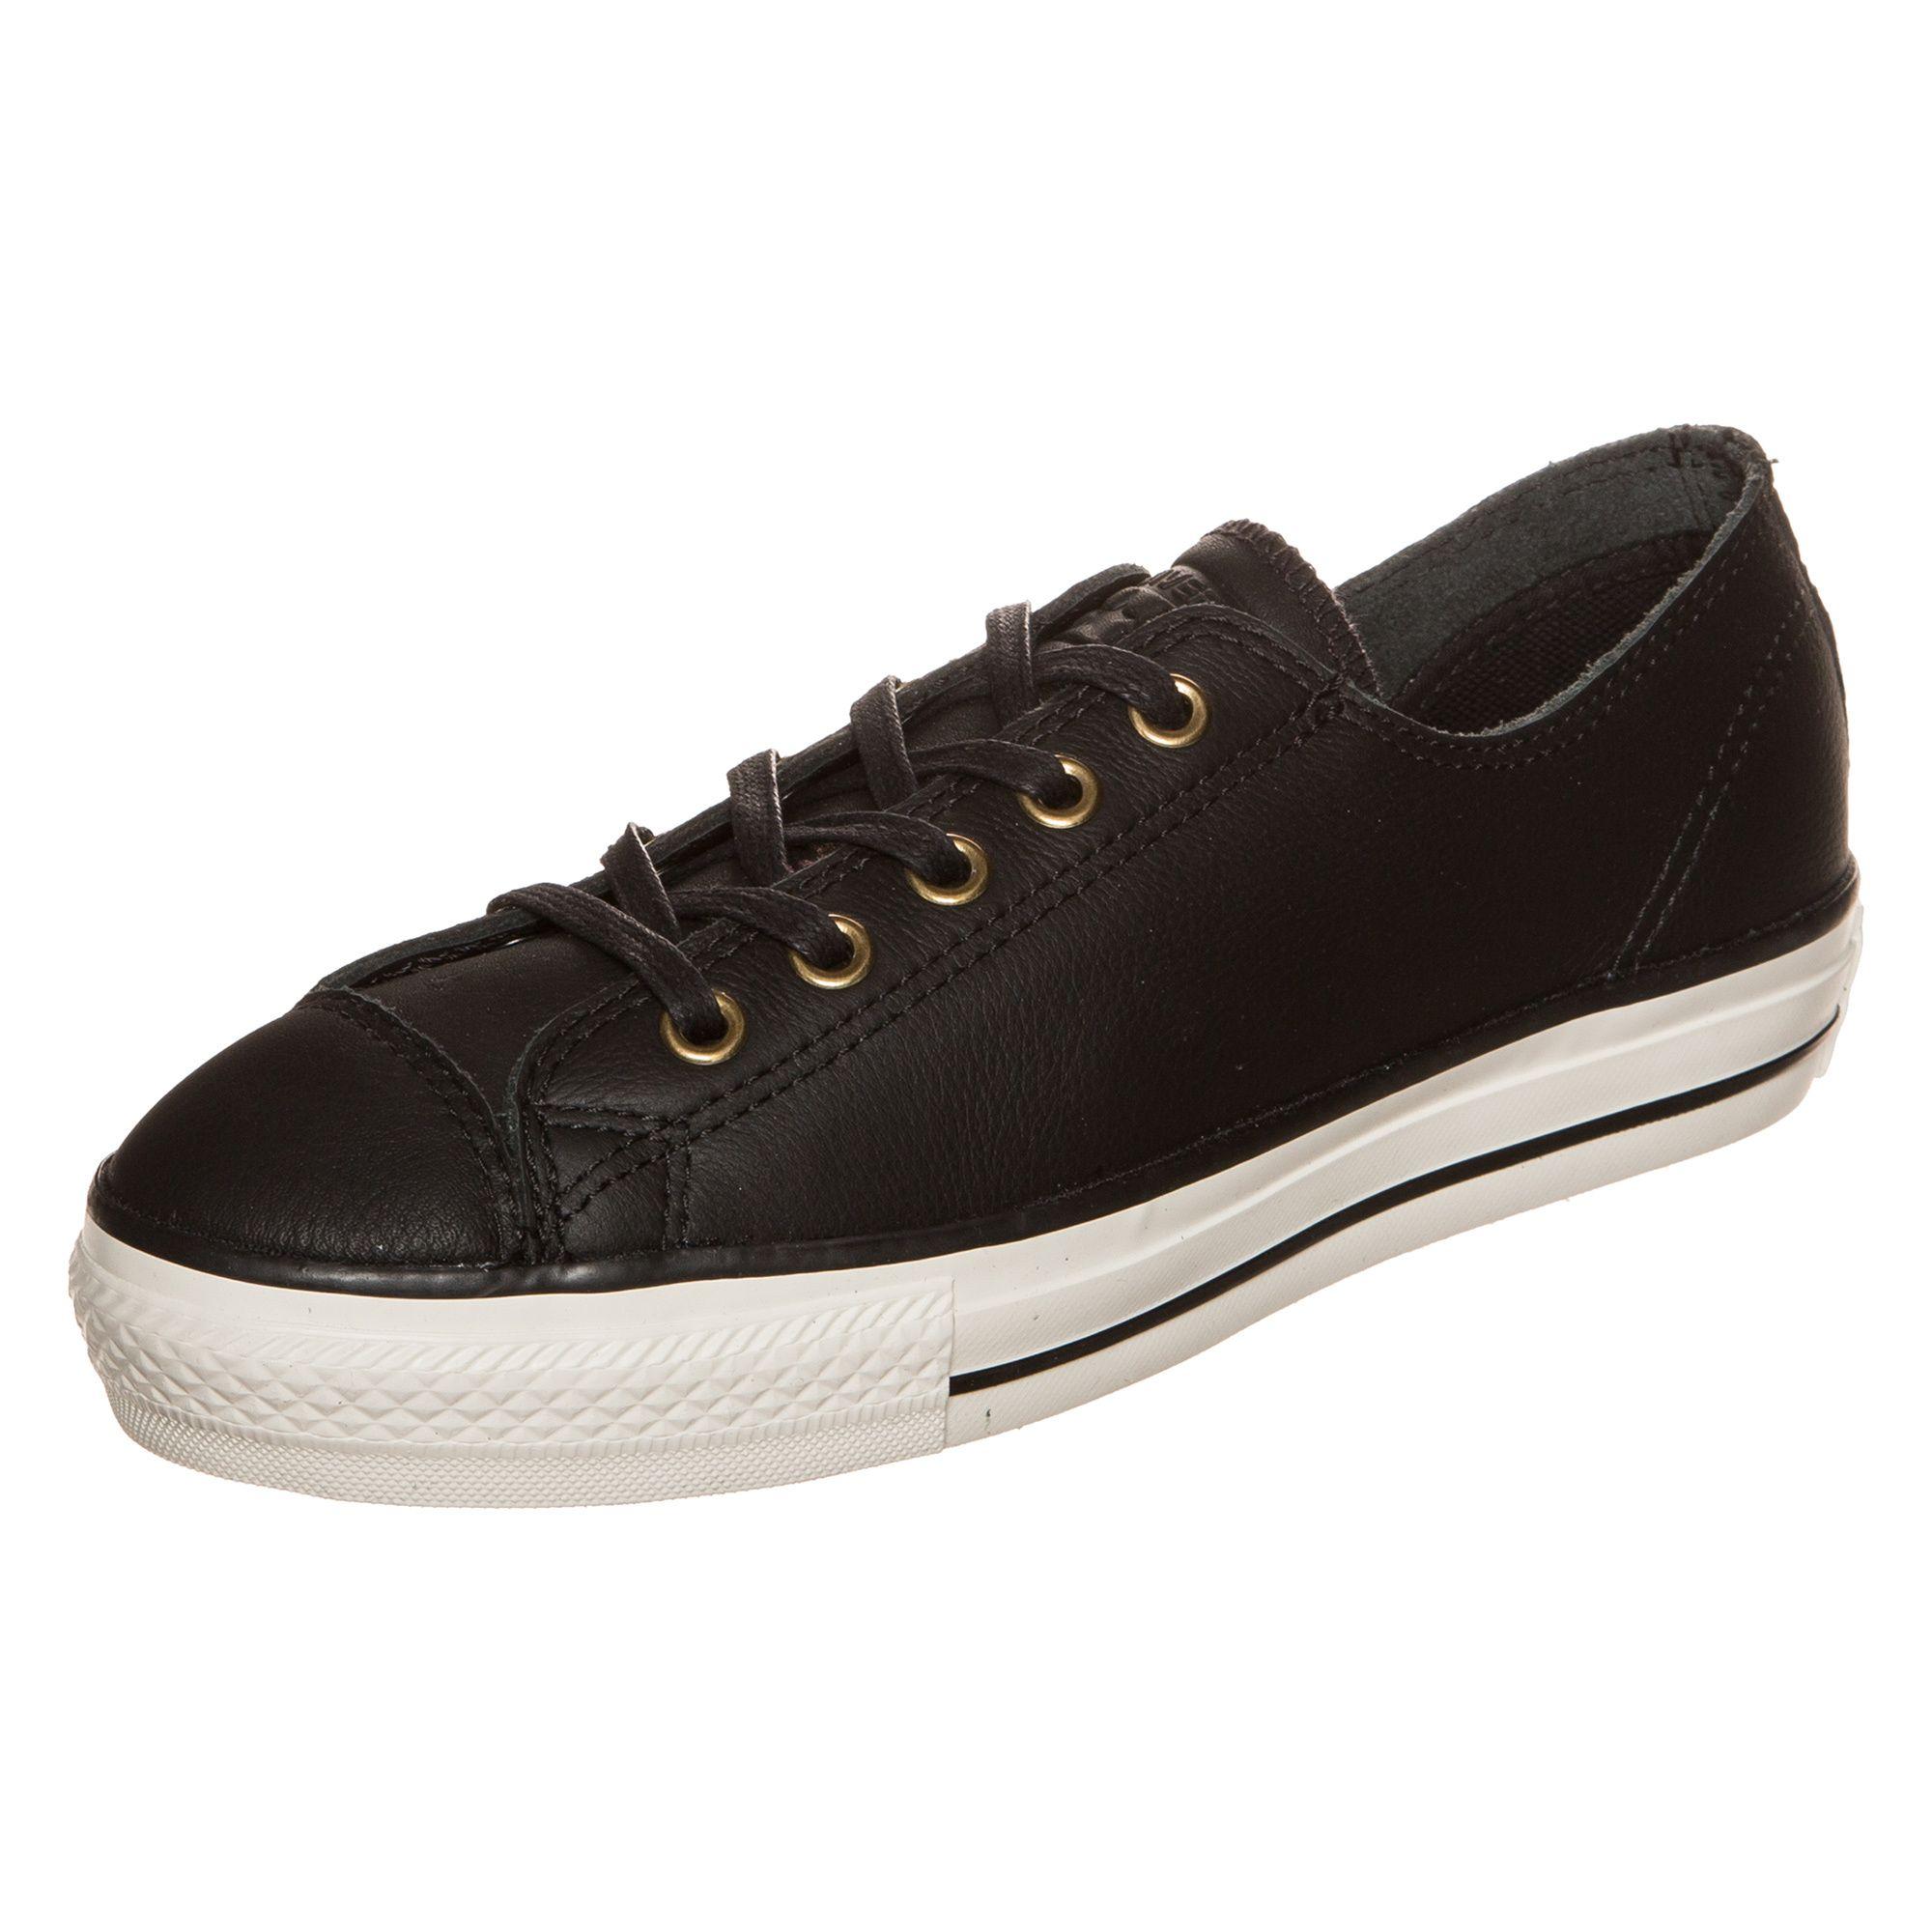 CONVERSE Converse Chuck Taylor All Star High Line OX Sneaker